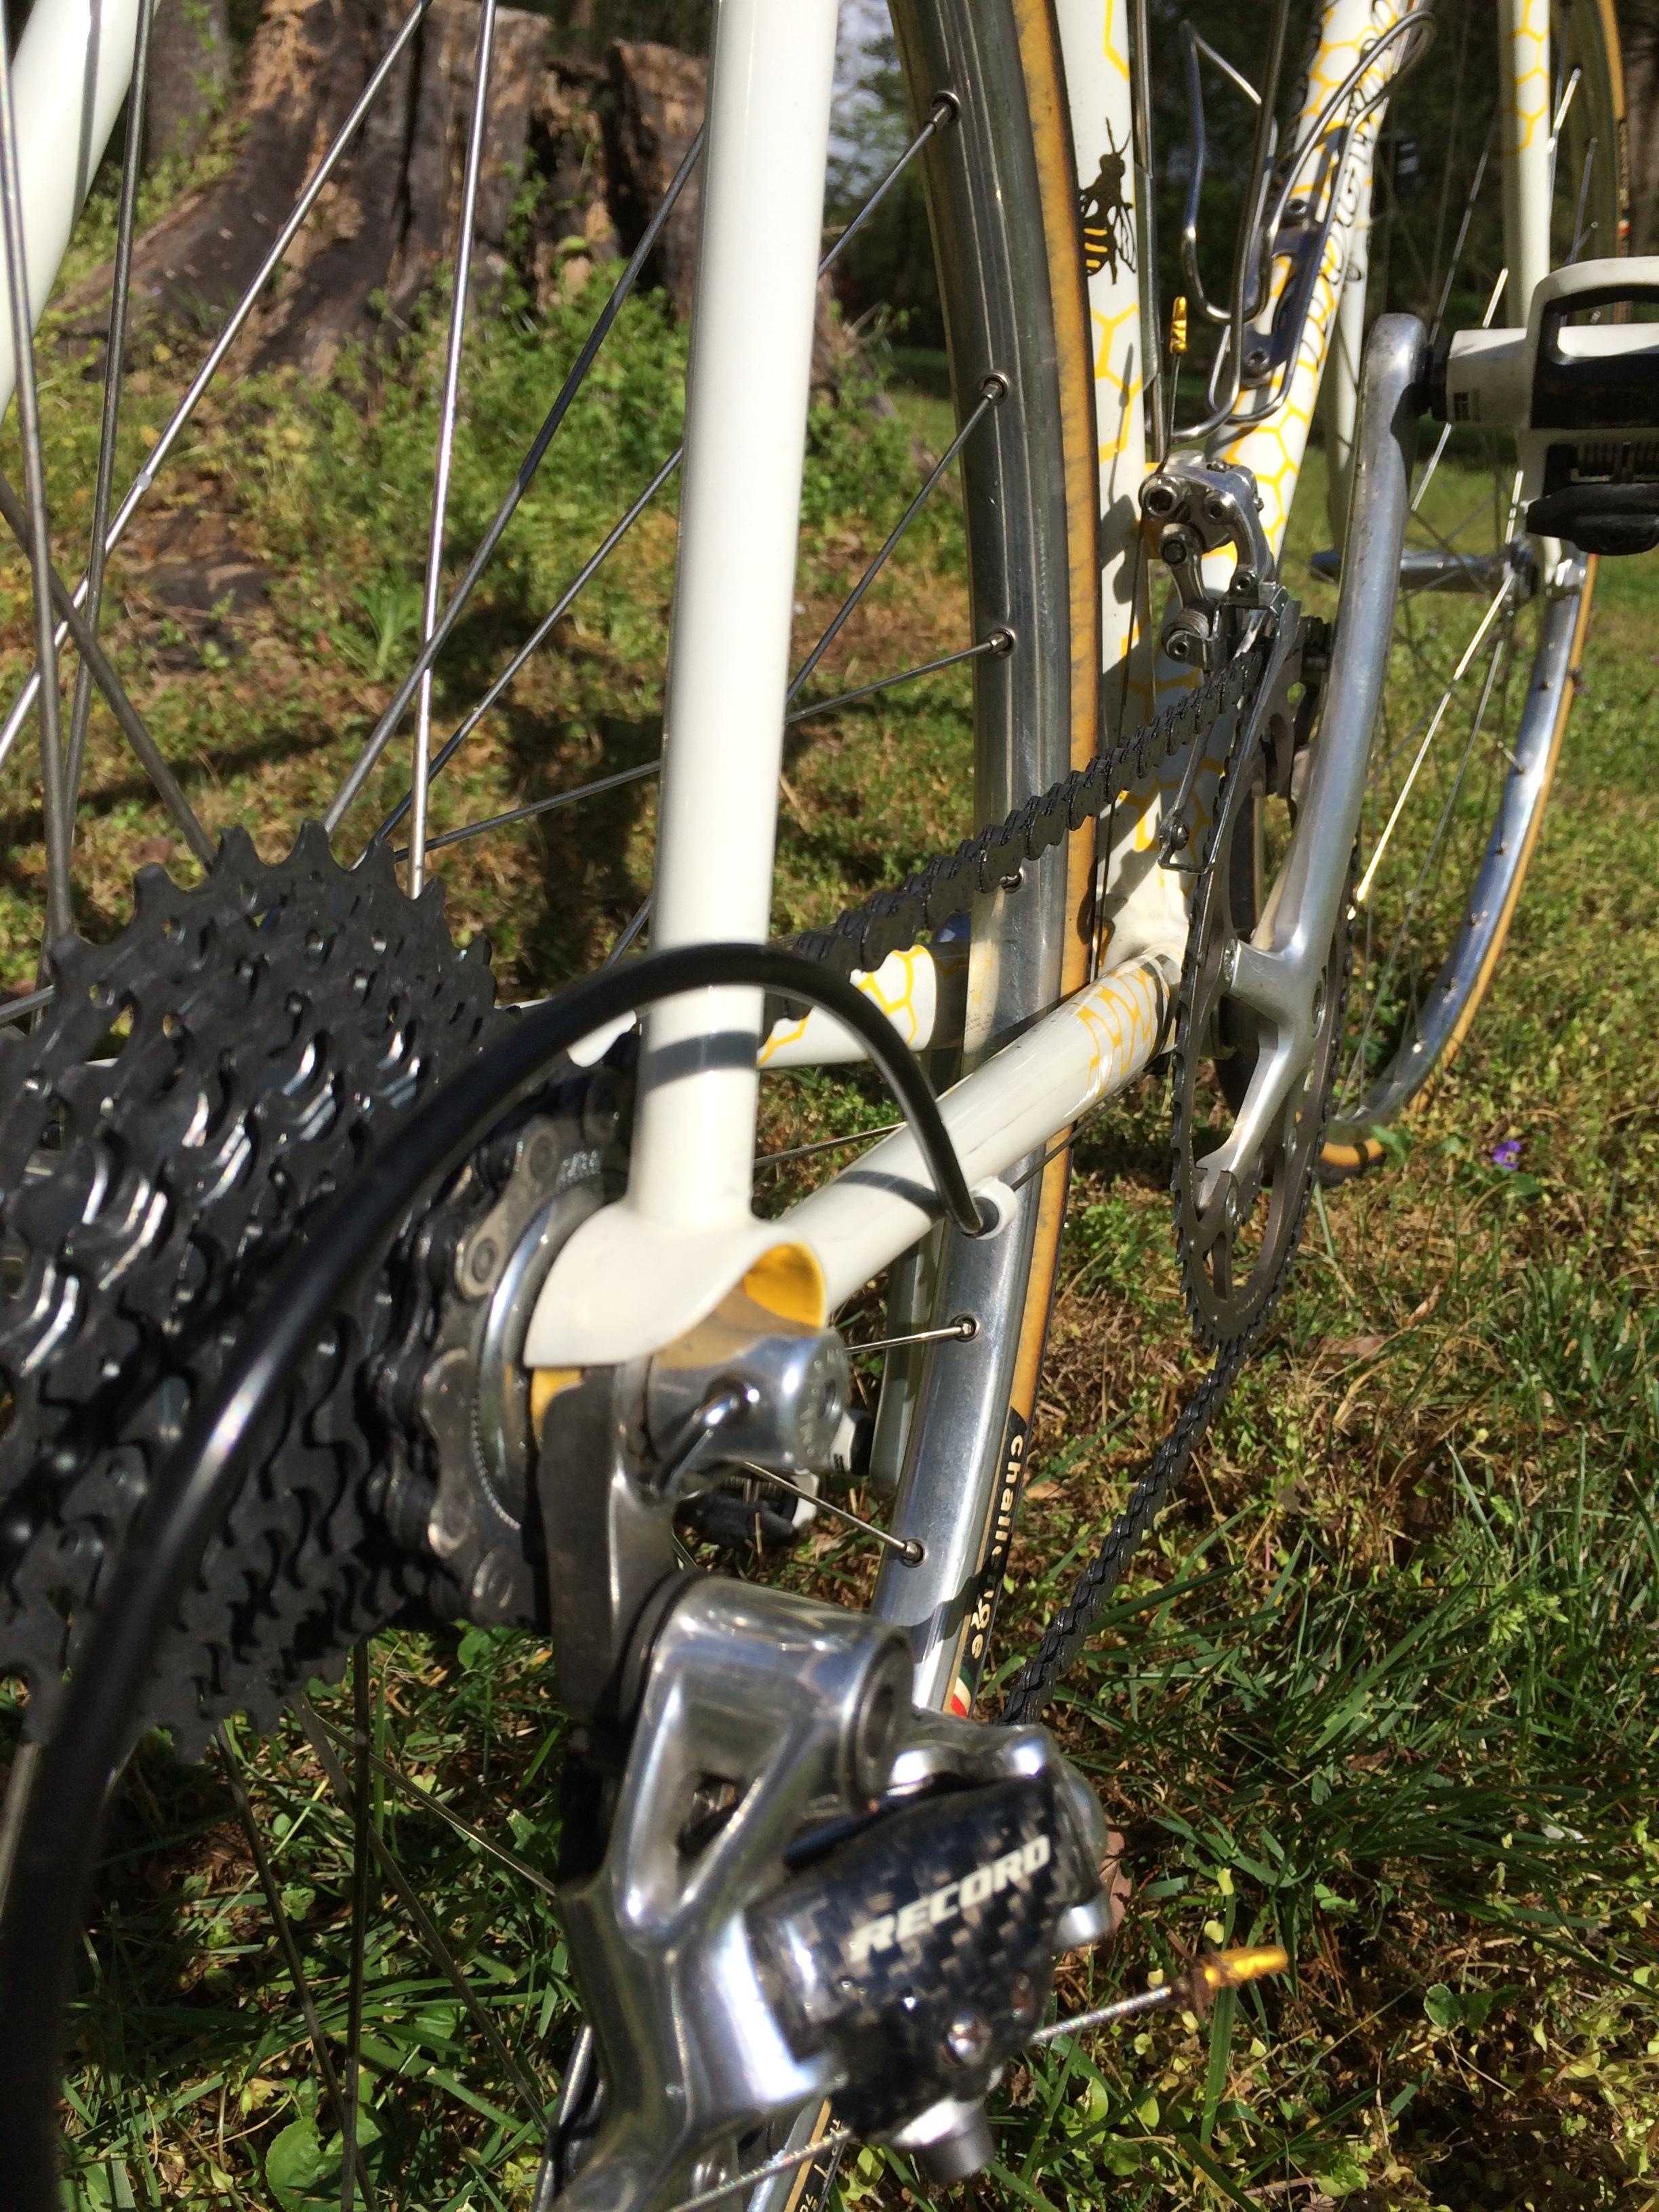 Dogwood-Cycleworx-steel-road-bicycle-columbus-tubing-custom-hand-made-7.jpg